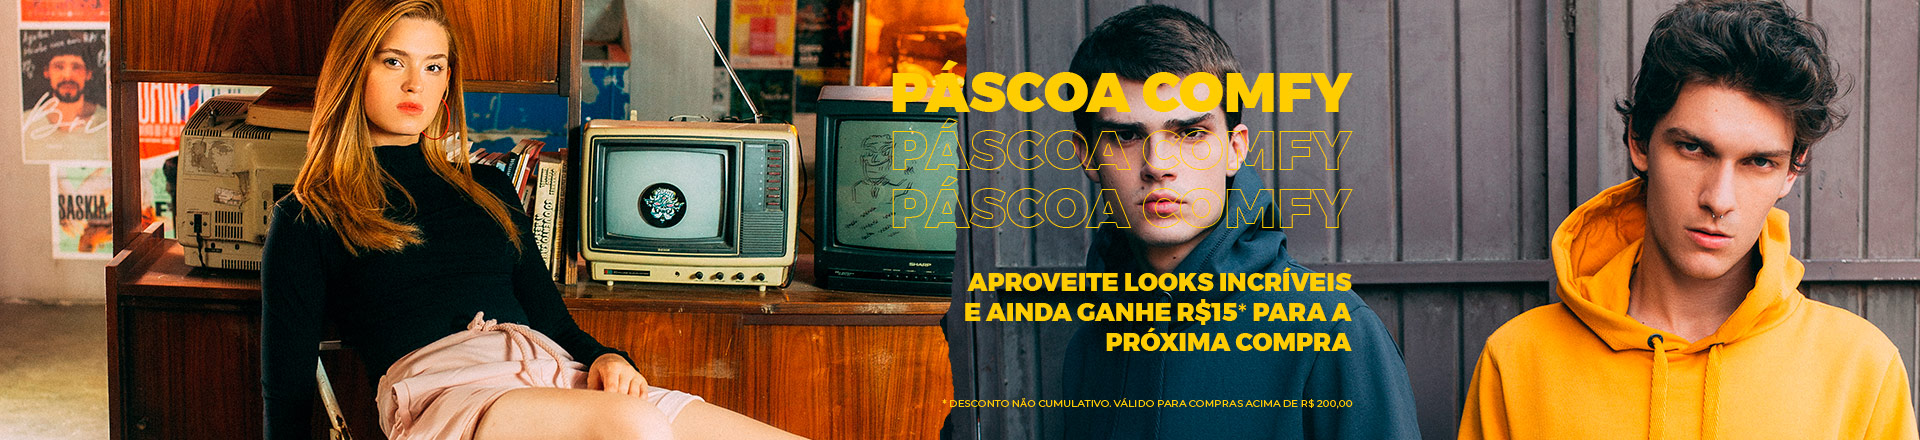 (DESK) V.A. Comfy Páscoa